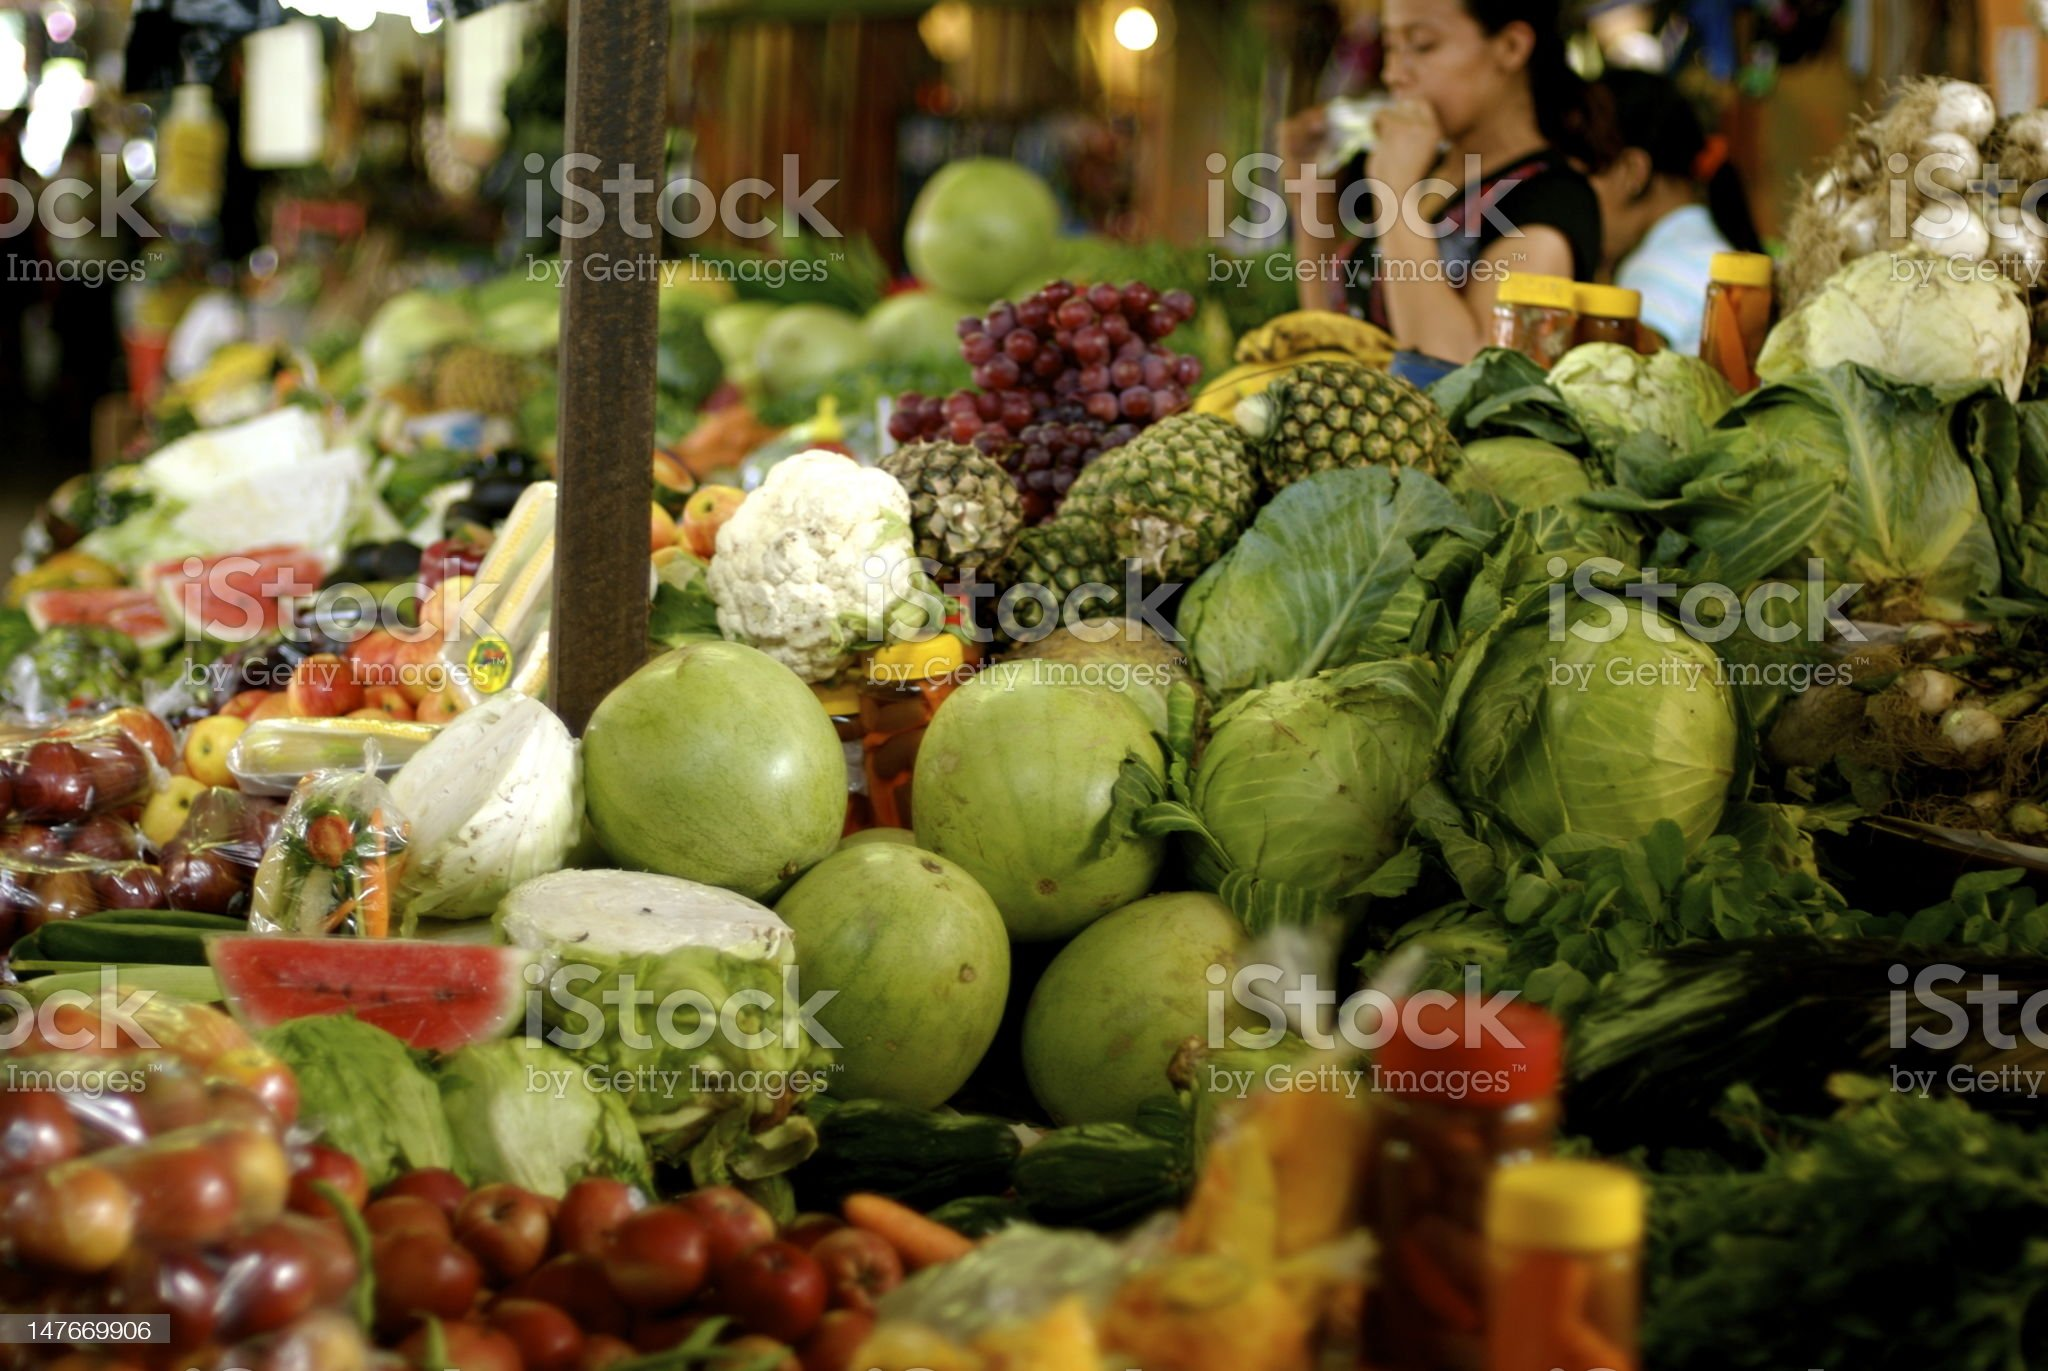 El Salvadorian street market royalty-free stock photo